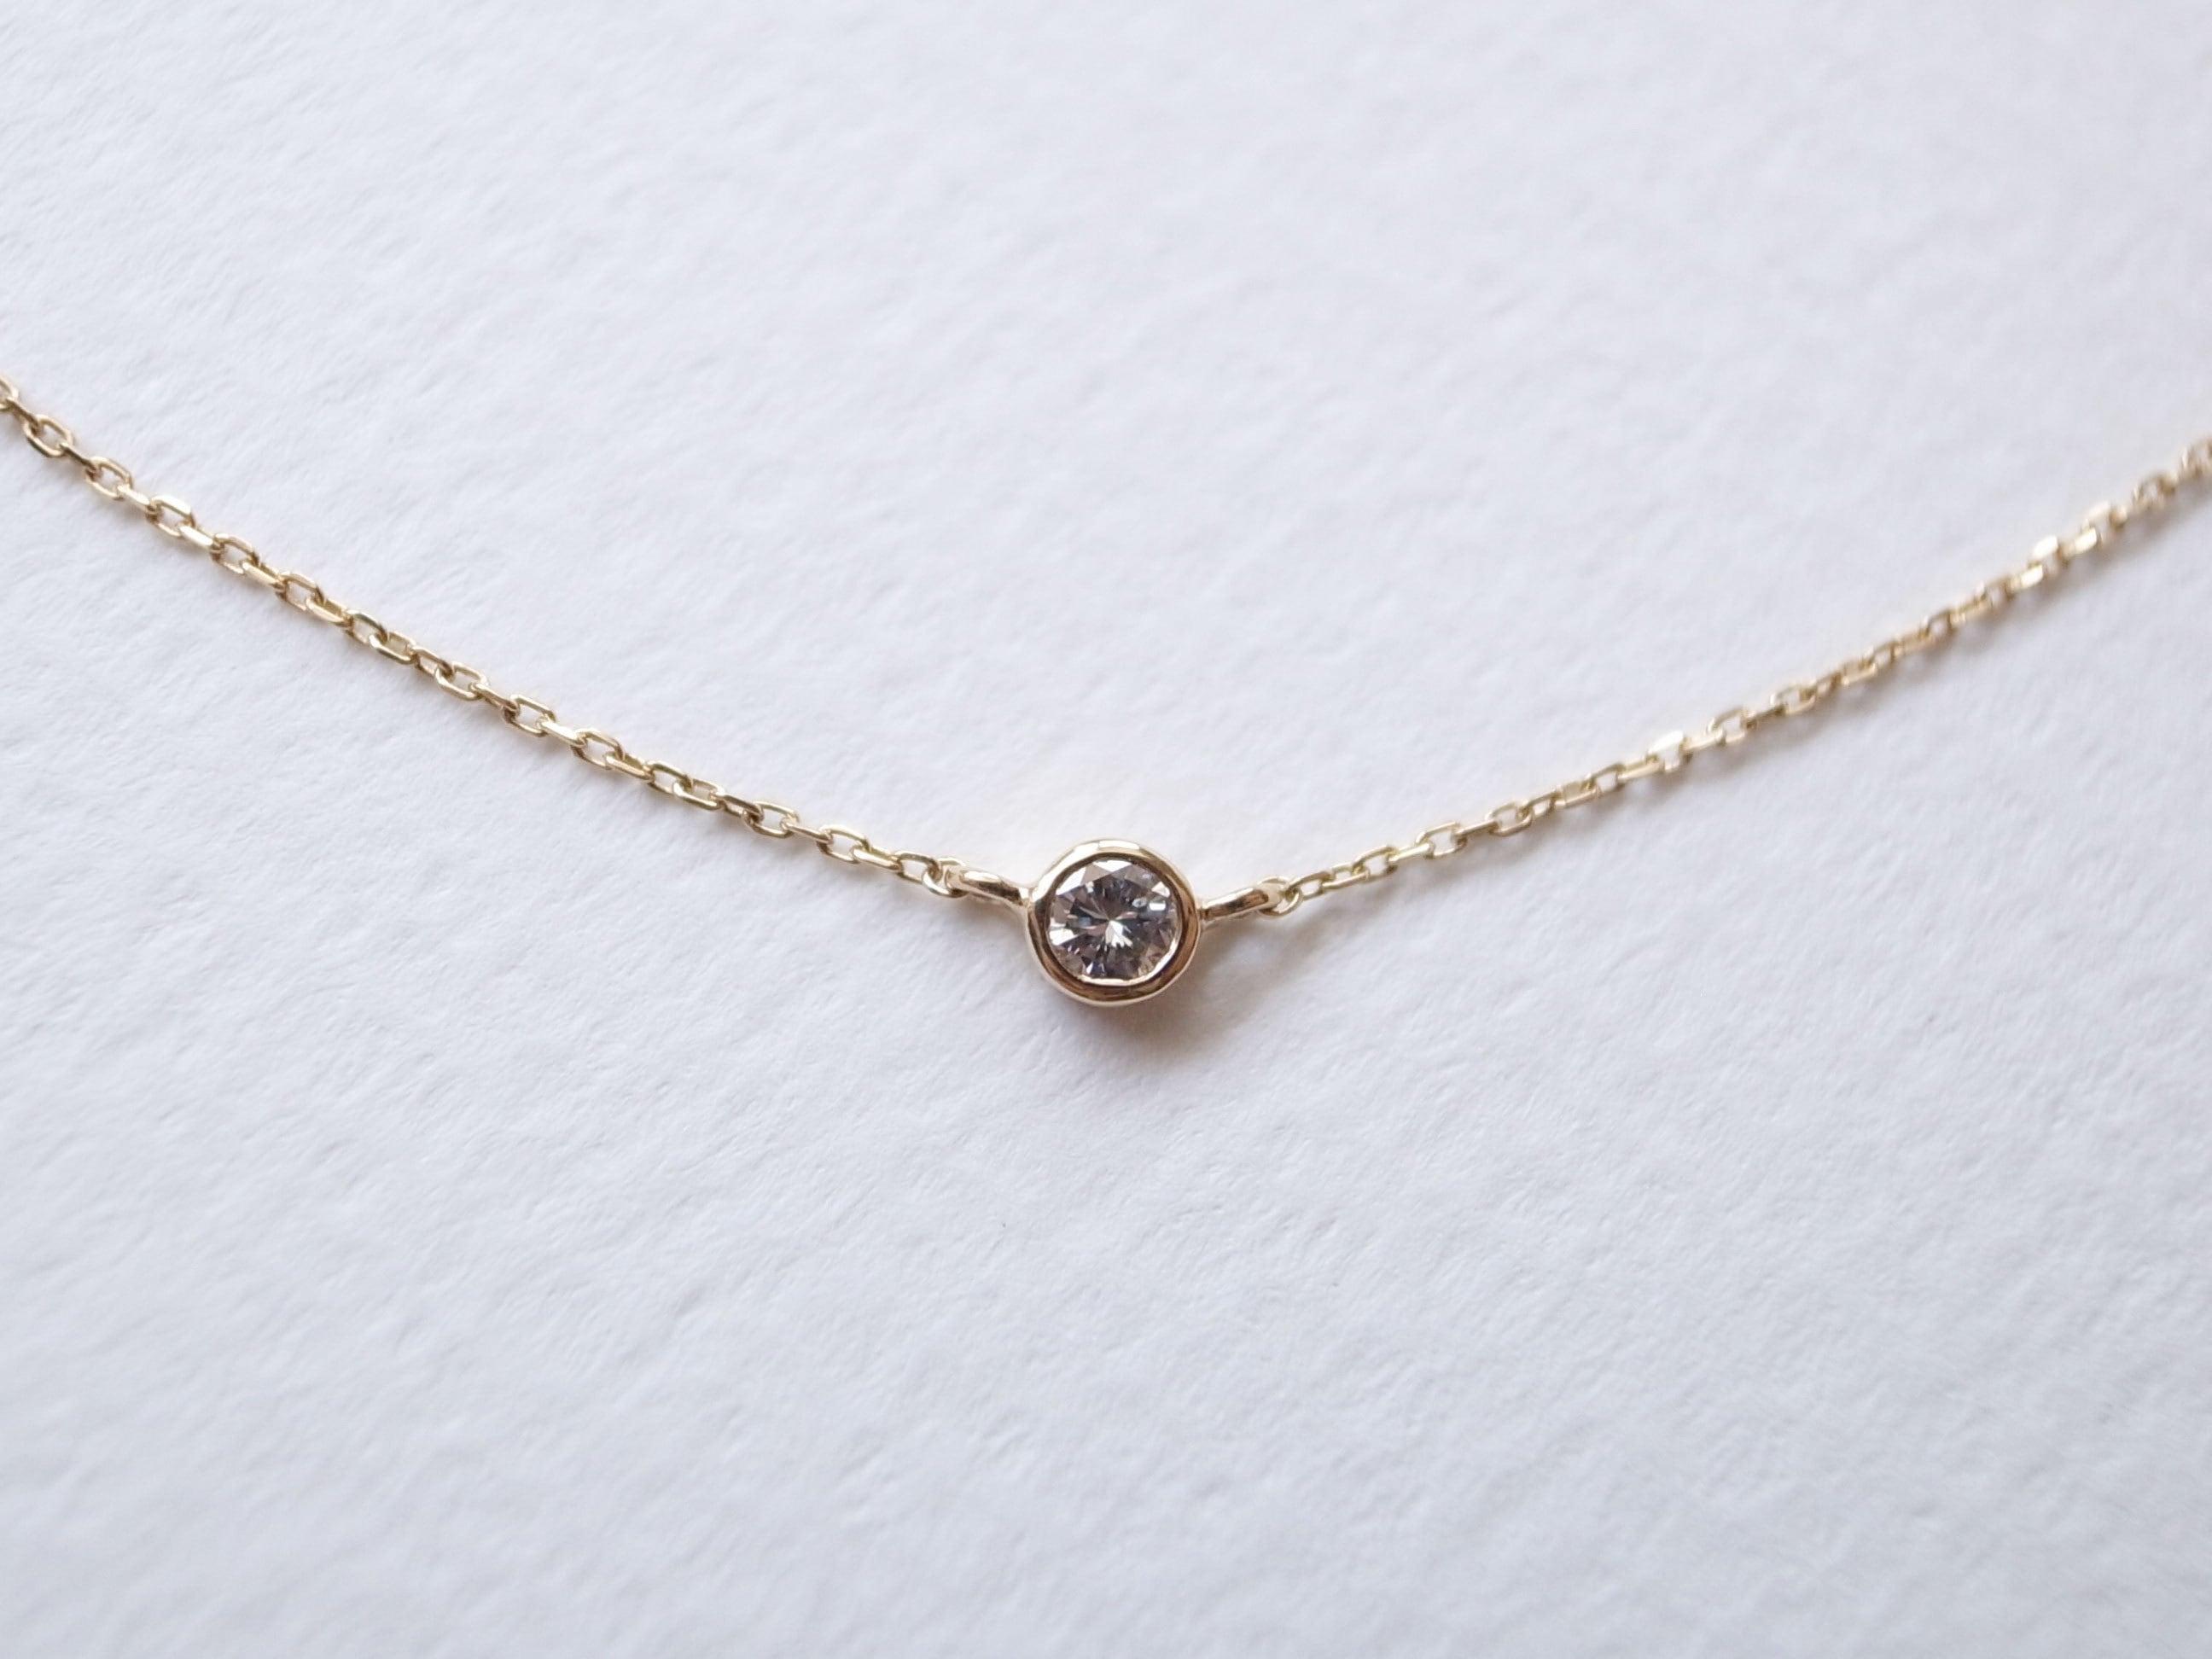 K18YG Diamond/2.5round grain necklace